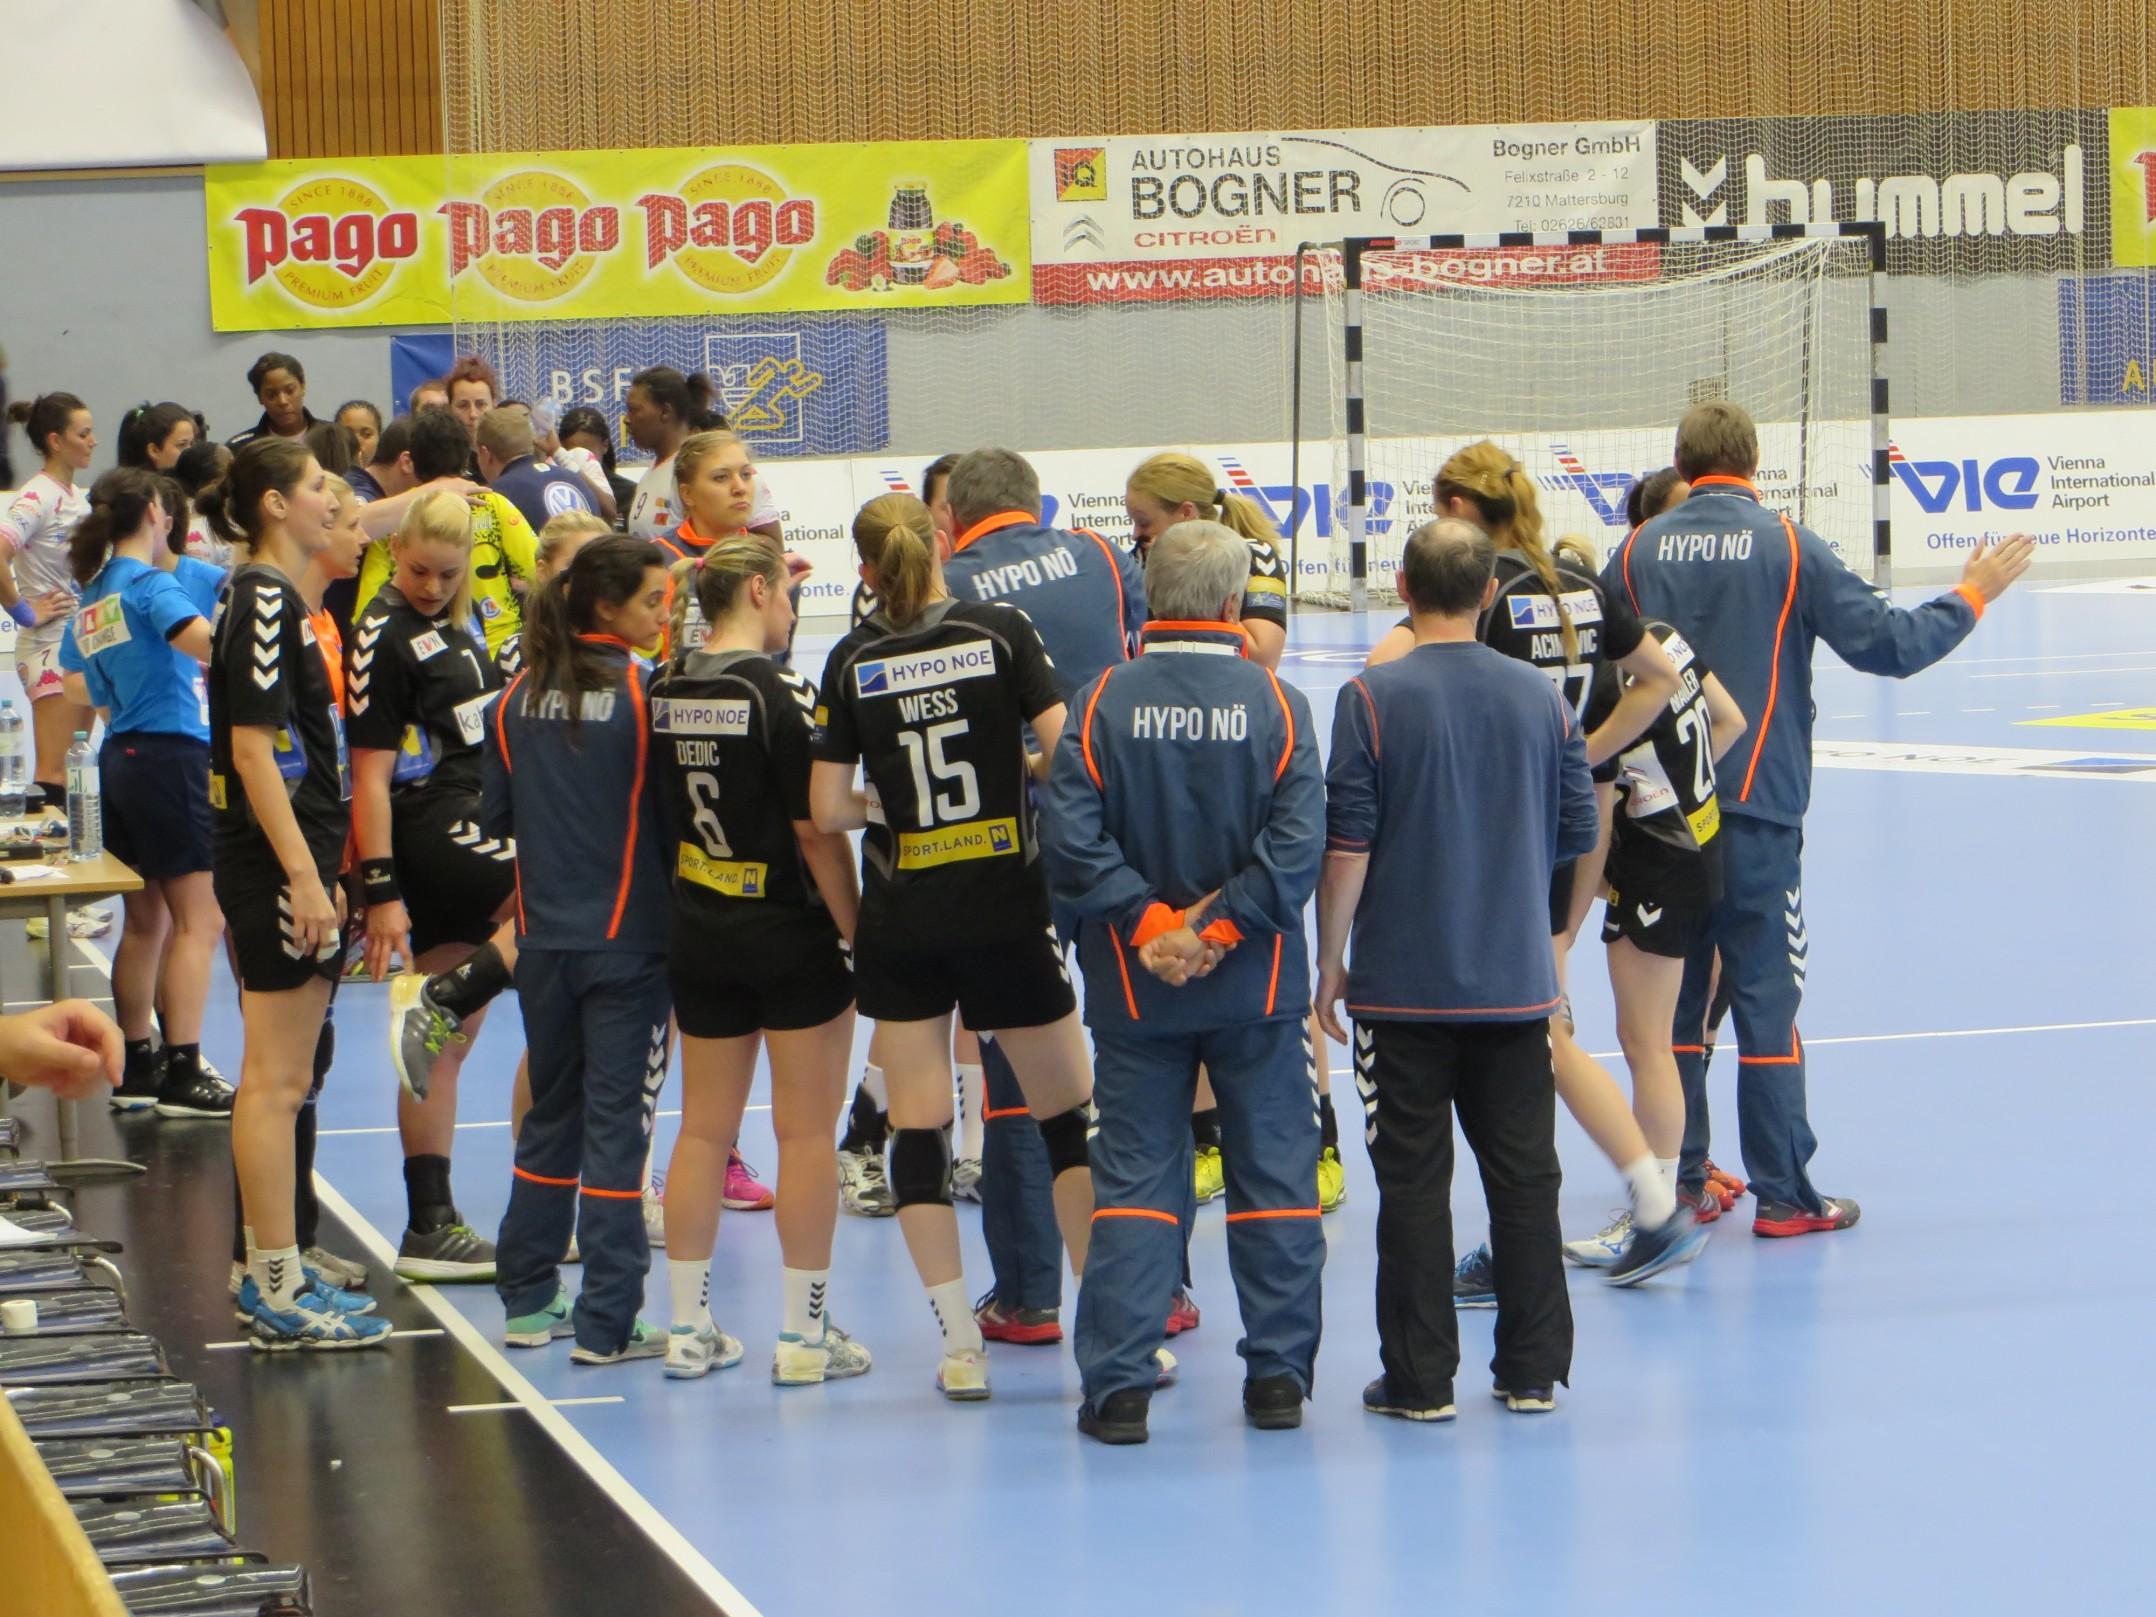 Handball coupe d 39 europe des vainqueurs de coupe hypo - Coupe d europe de handball ...